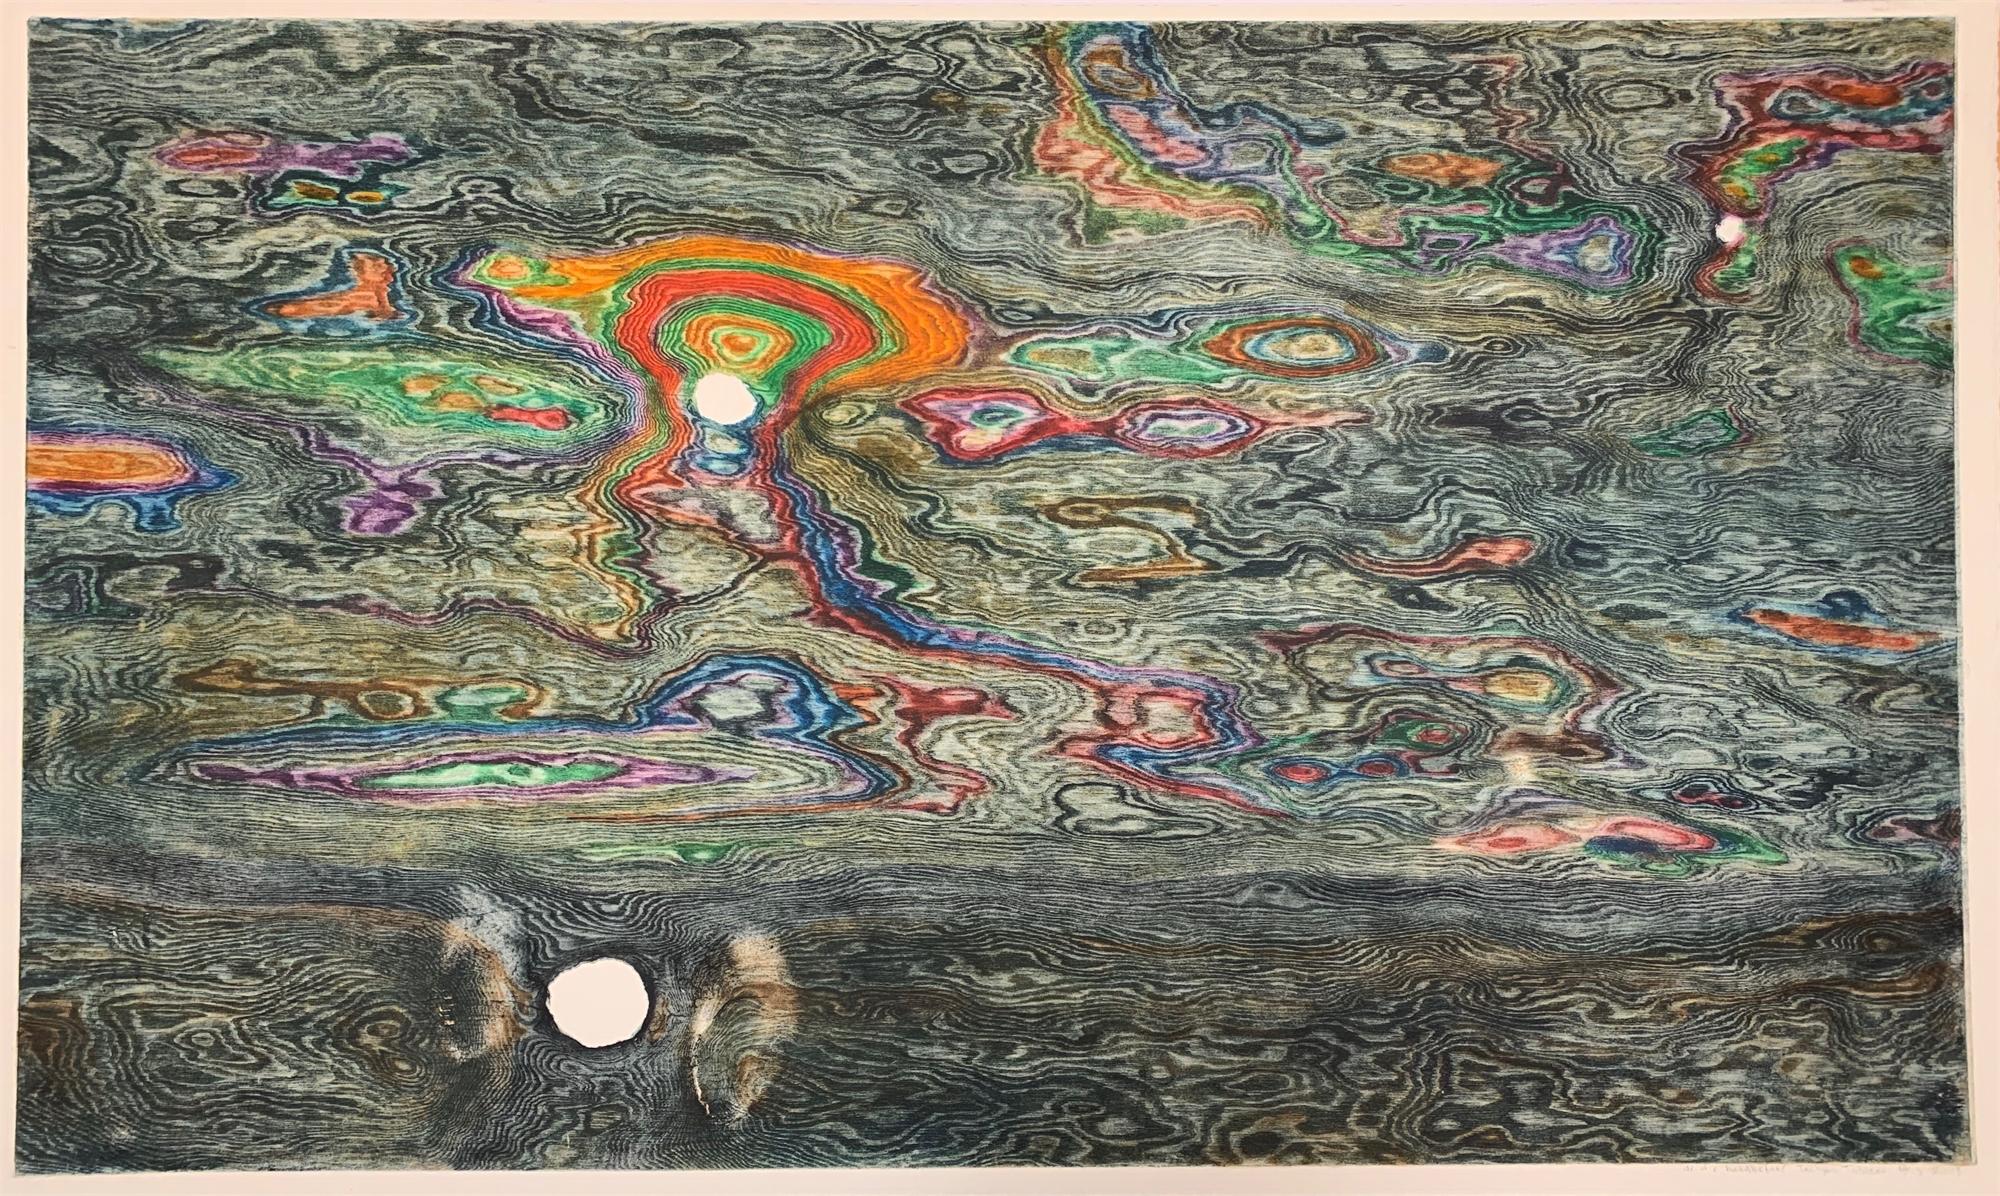 Tachyon Tableau 10/13 by David Hefner